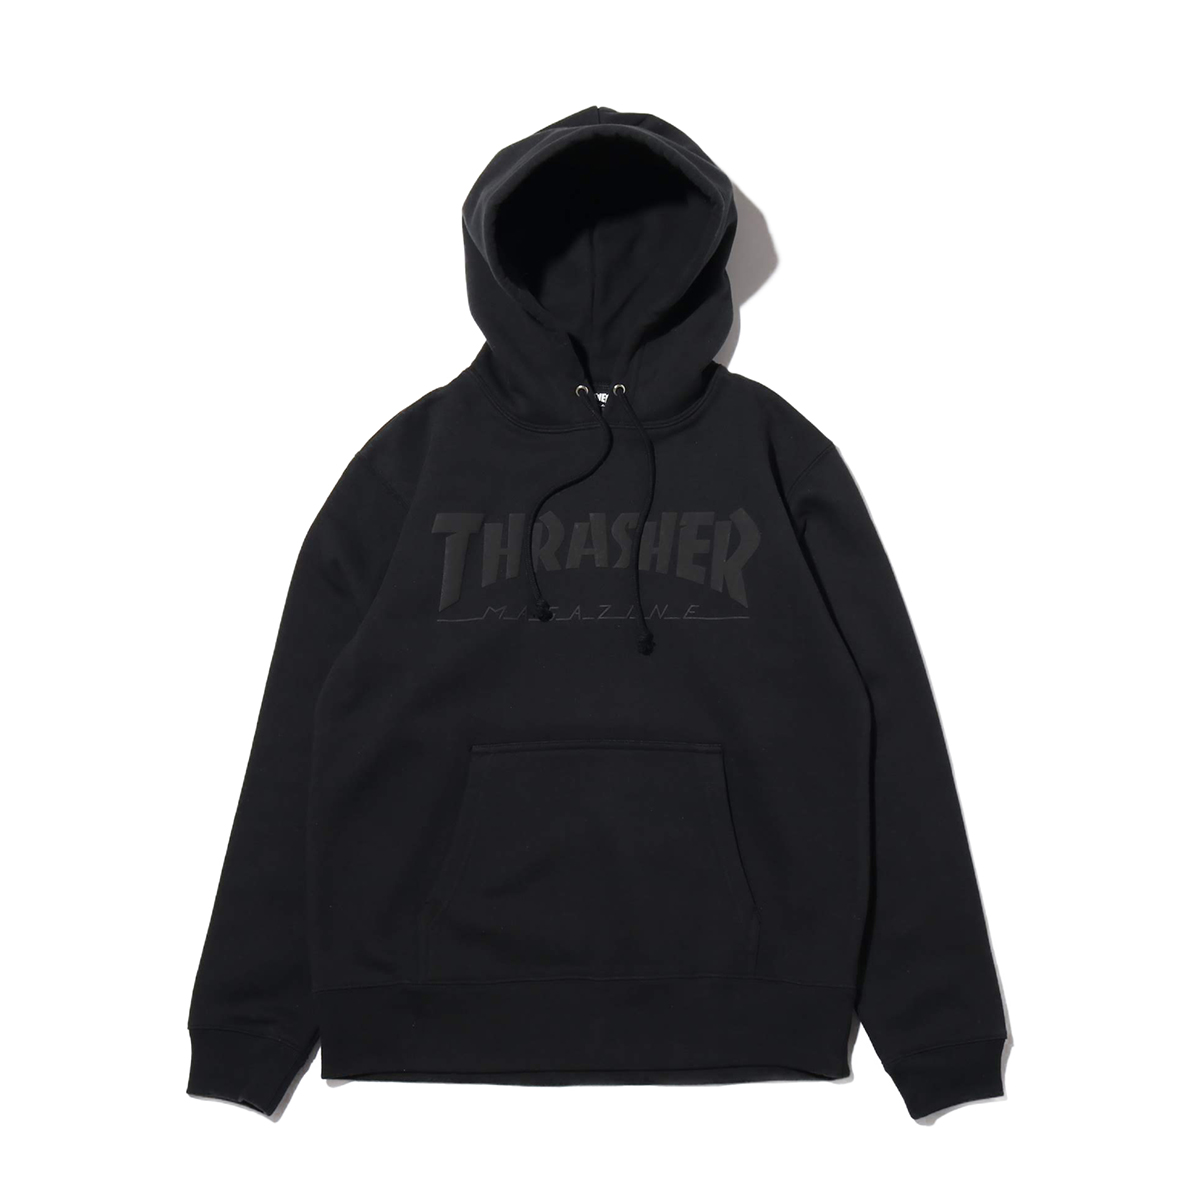 THRASHER Foaming HOMETOWN Pullover Hoodie(スラッシャー フォーミング ホームタウン プルオーバー フーディー)BLACK【メンズ パーカー】19HO-I